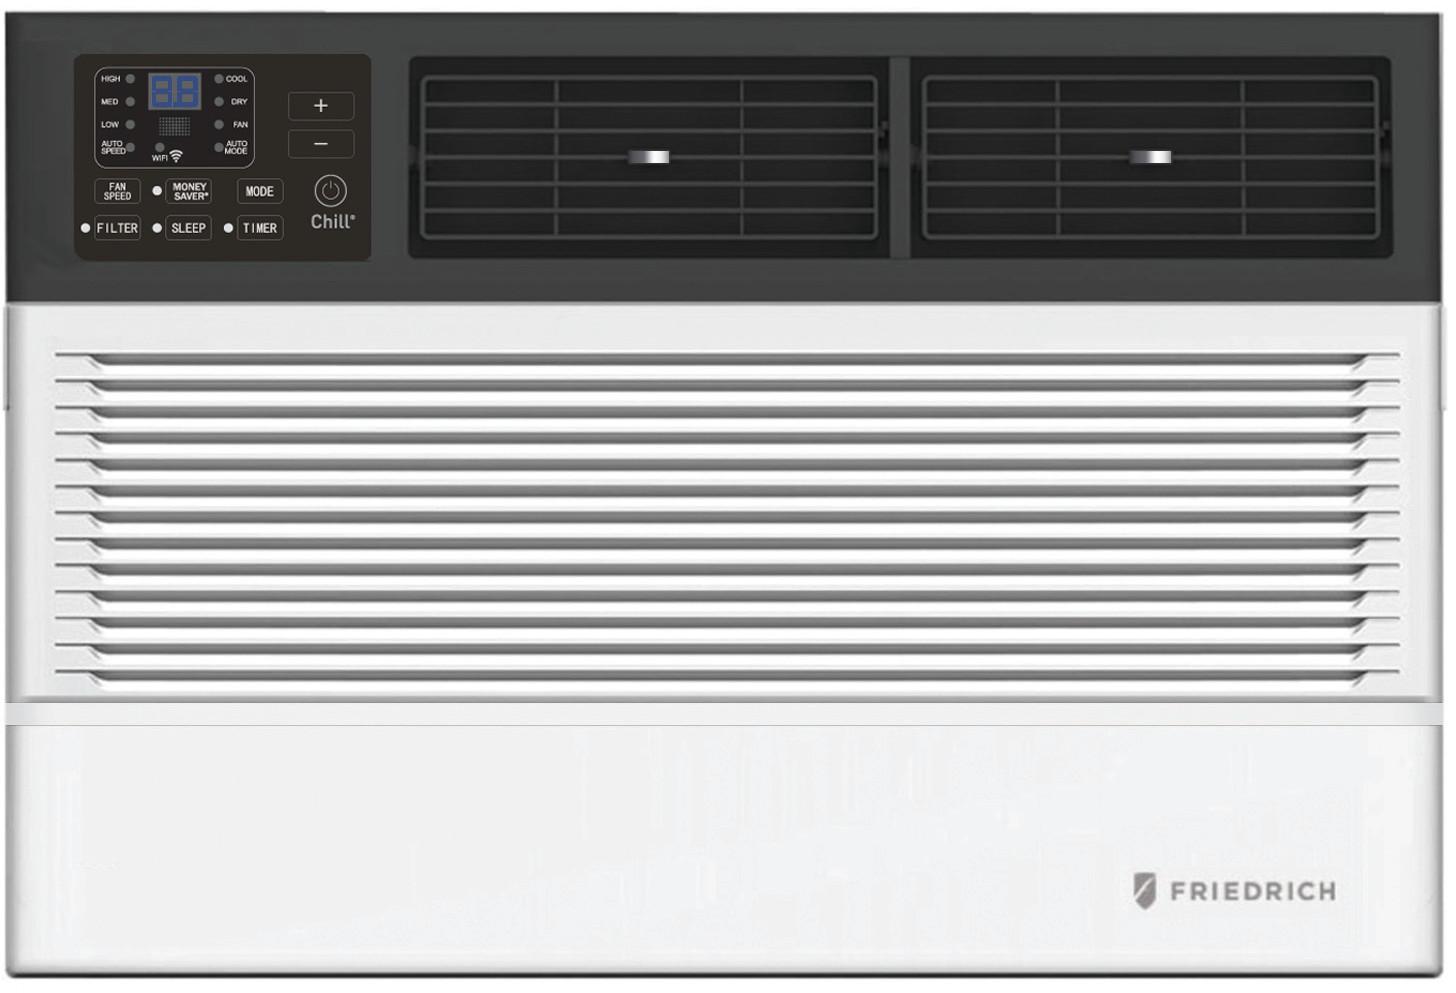 Friedrich Chill Premier 10,000 BTU Window Air Conditioner CCF10A10A